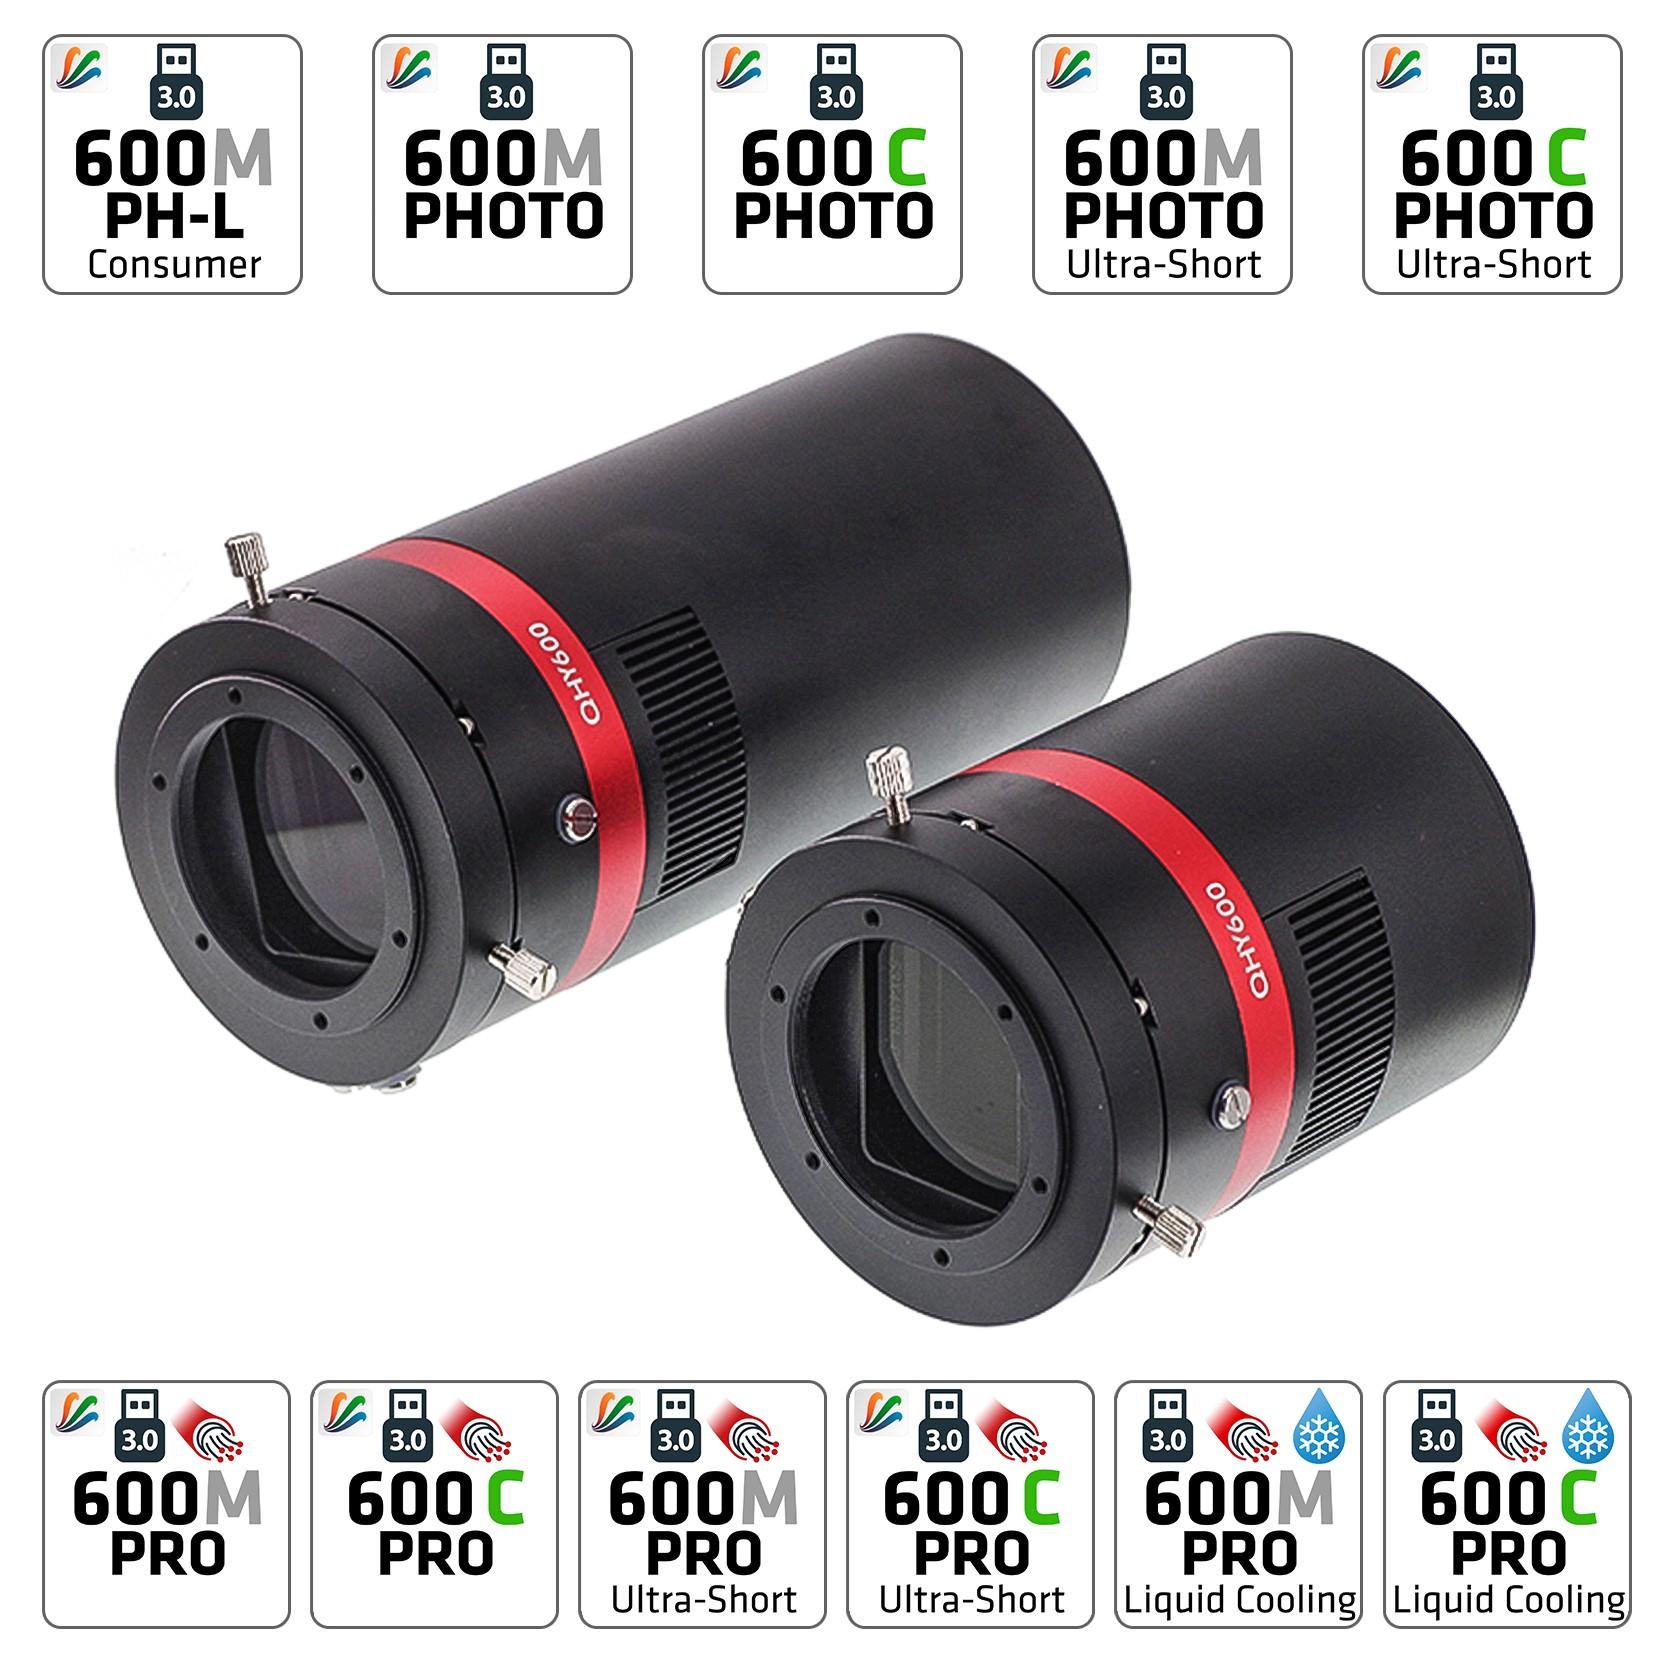 QHY 600 M/C BSI Cooled Kameras